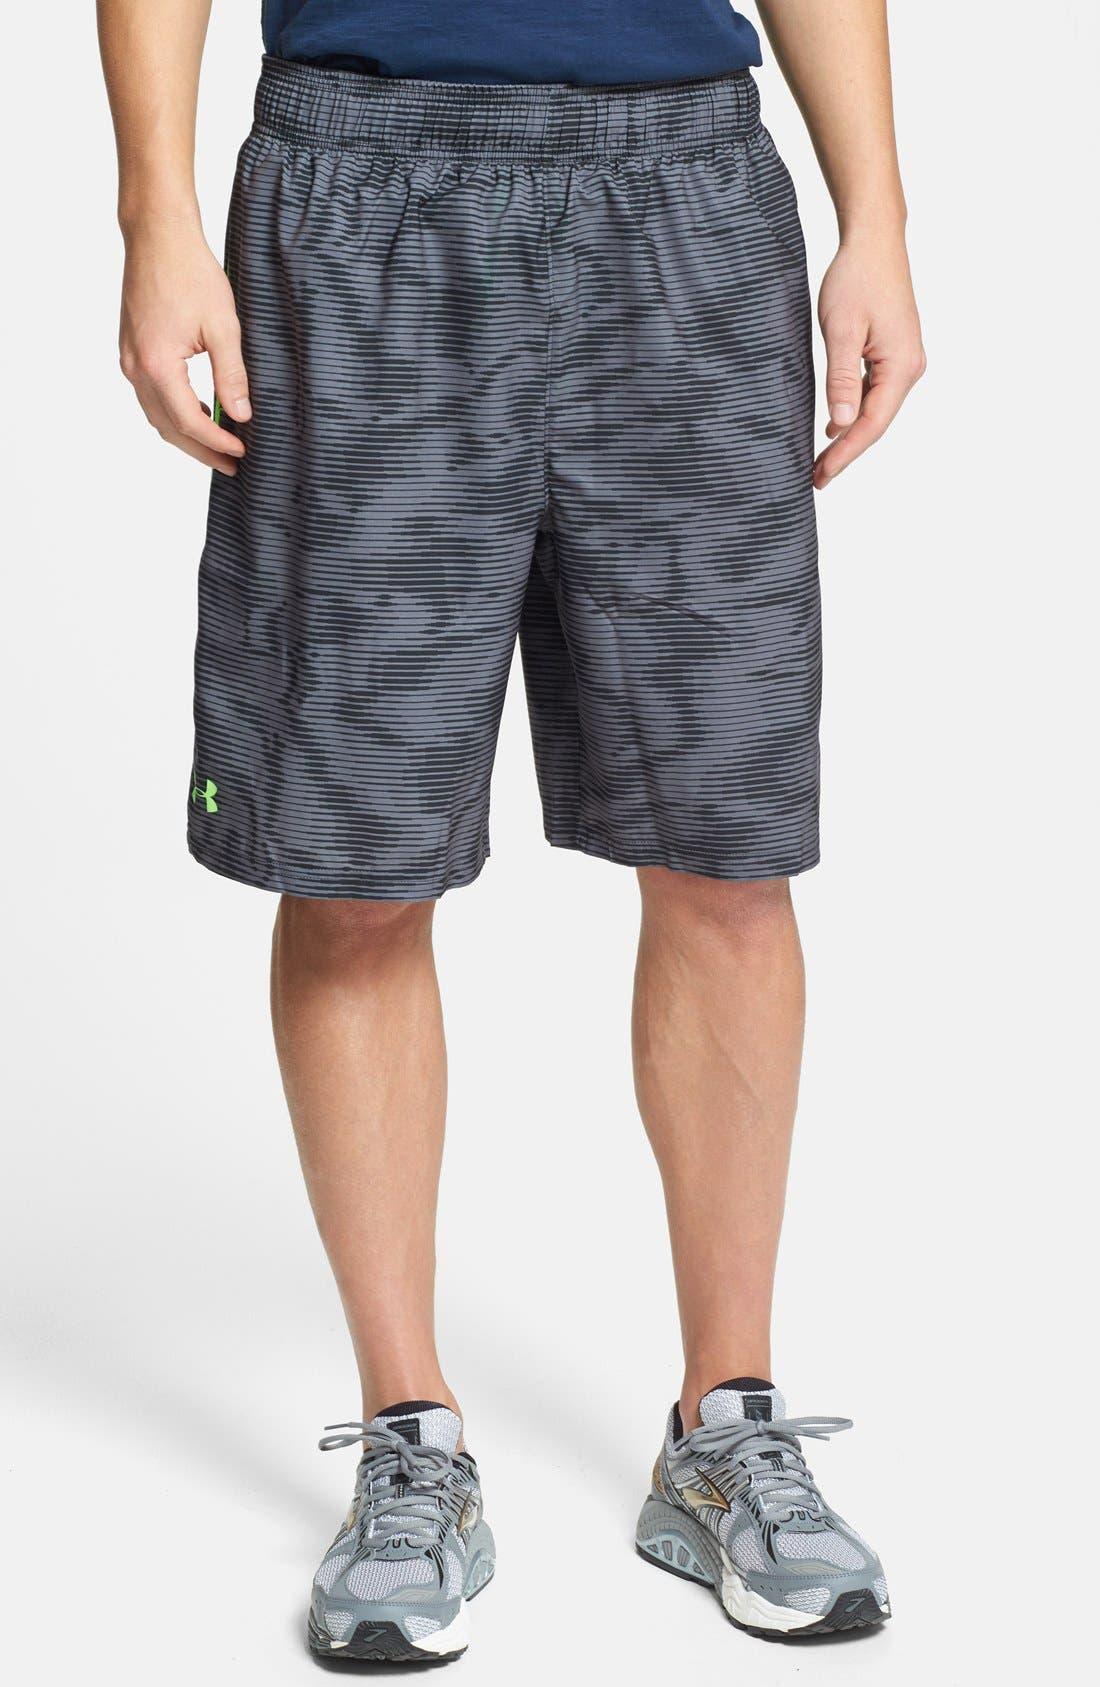 Main Image - Under Armour 'Mirage' HeatGear® Woven Shorts